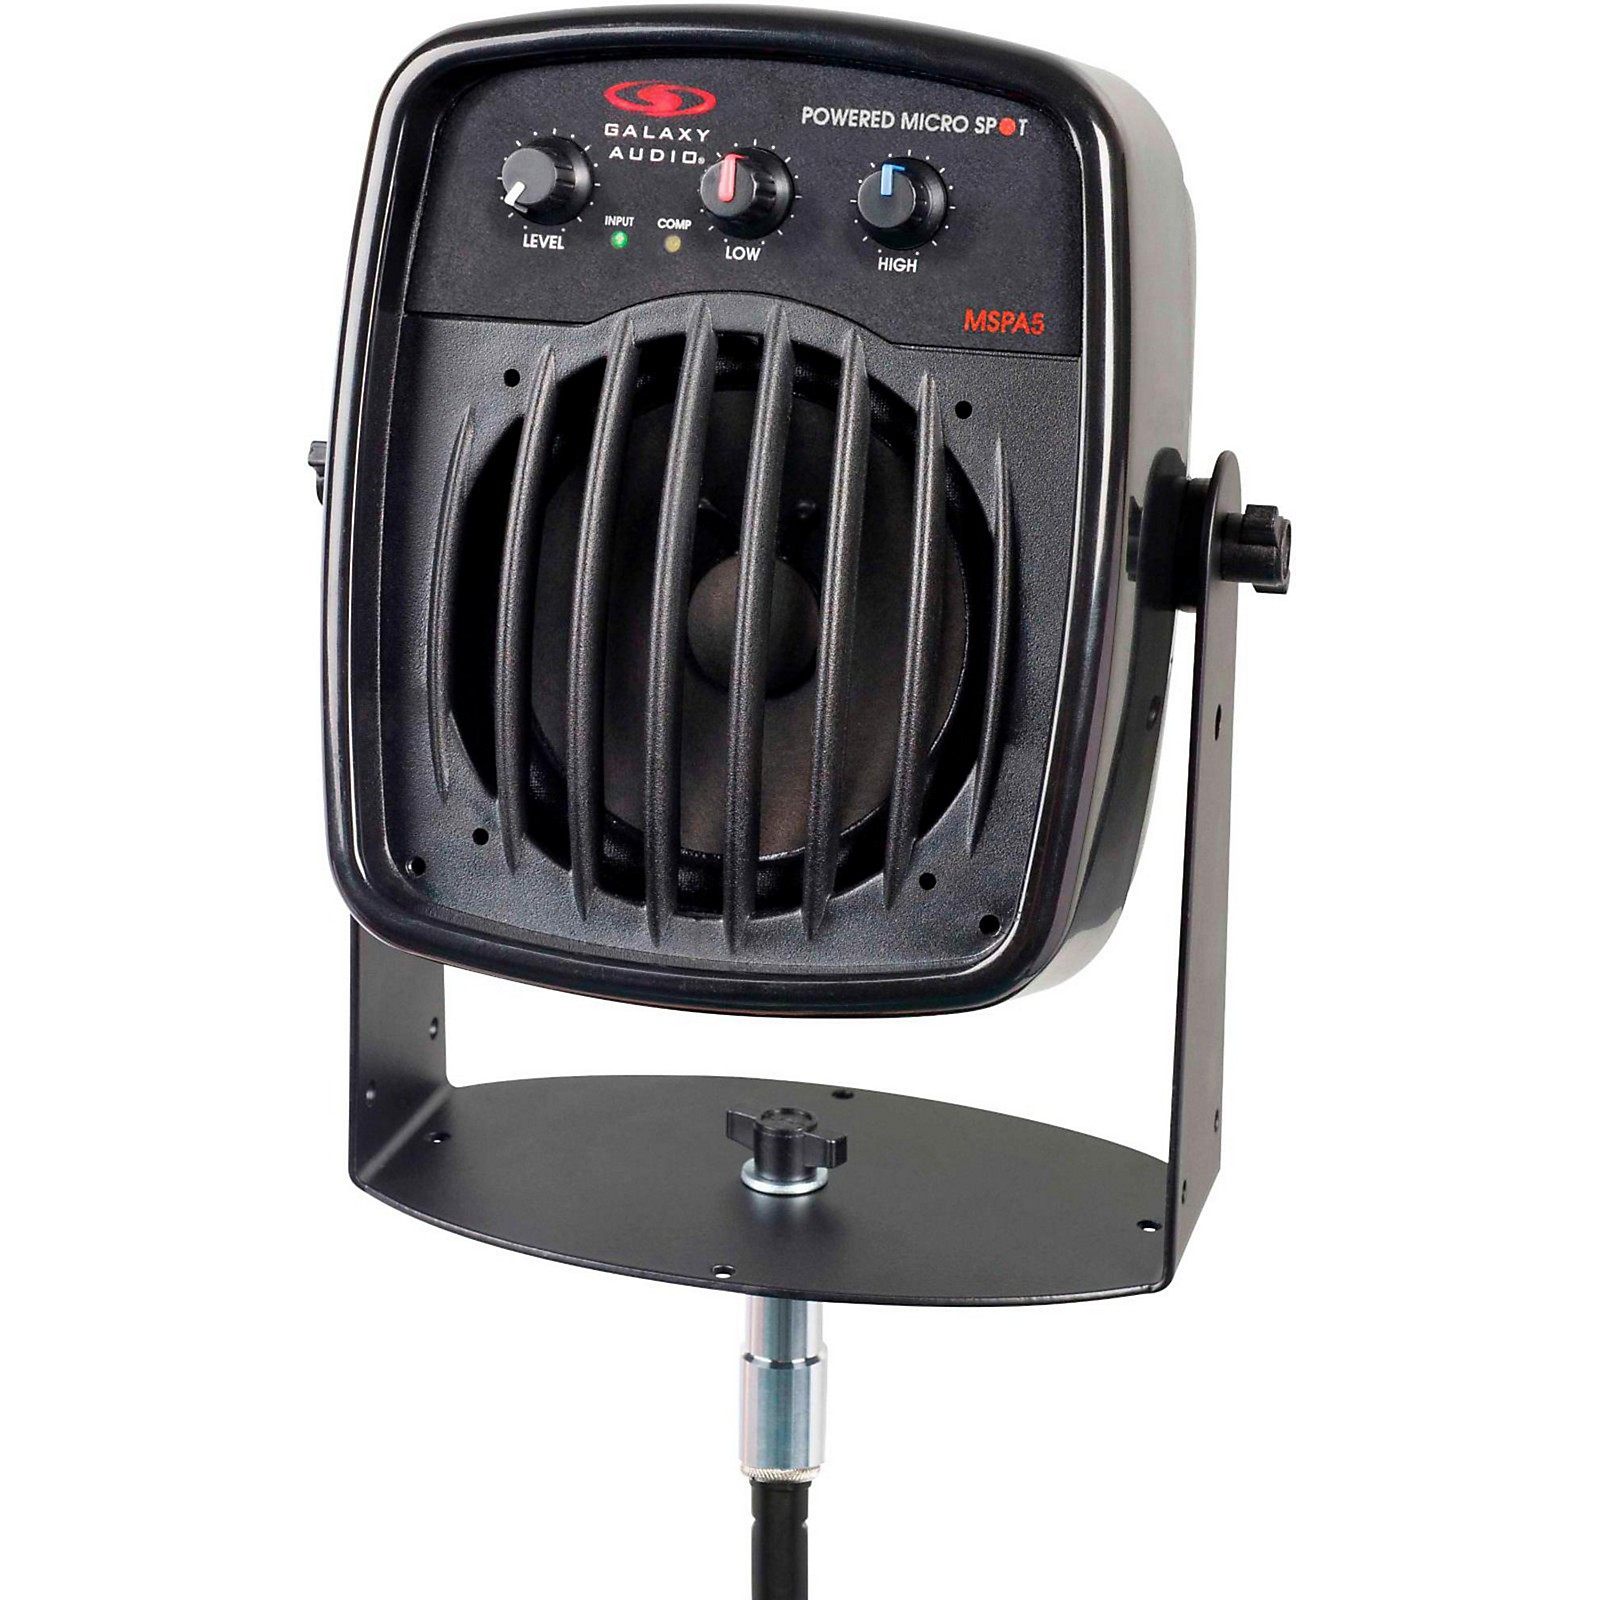 Open Box Galaxy Audio Galaxy Audio MSPA5 100W Powered Micro Spot  Compact Personal Hot Spot Stage Monitor<br>